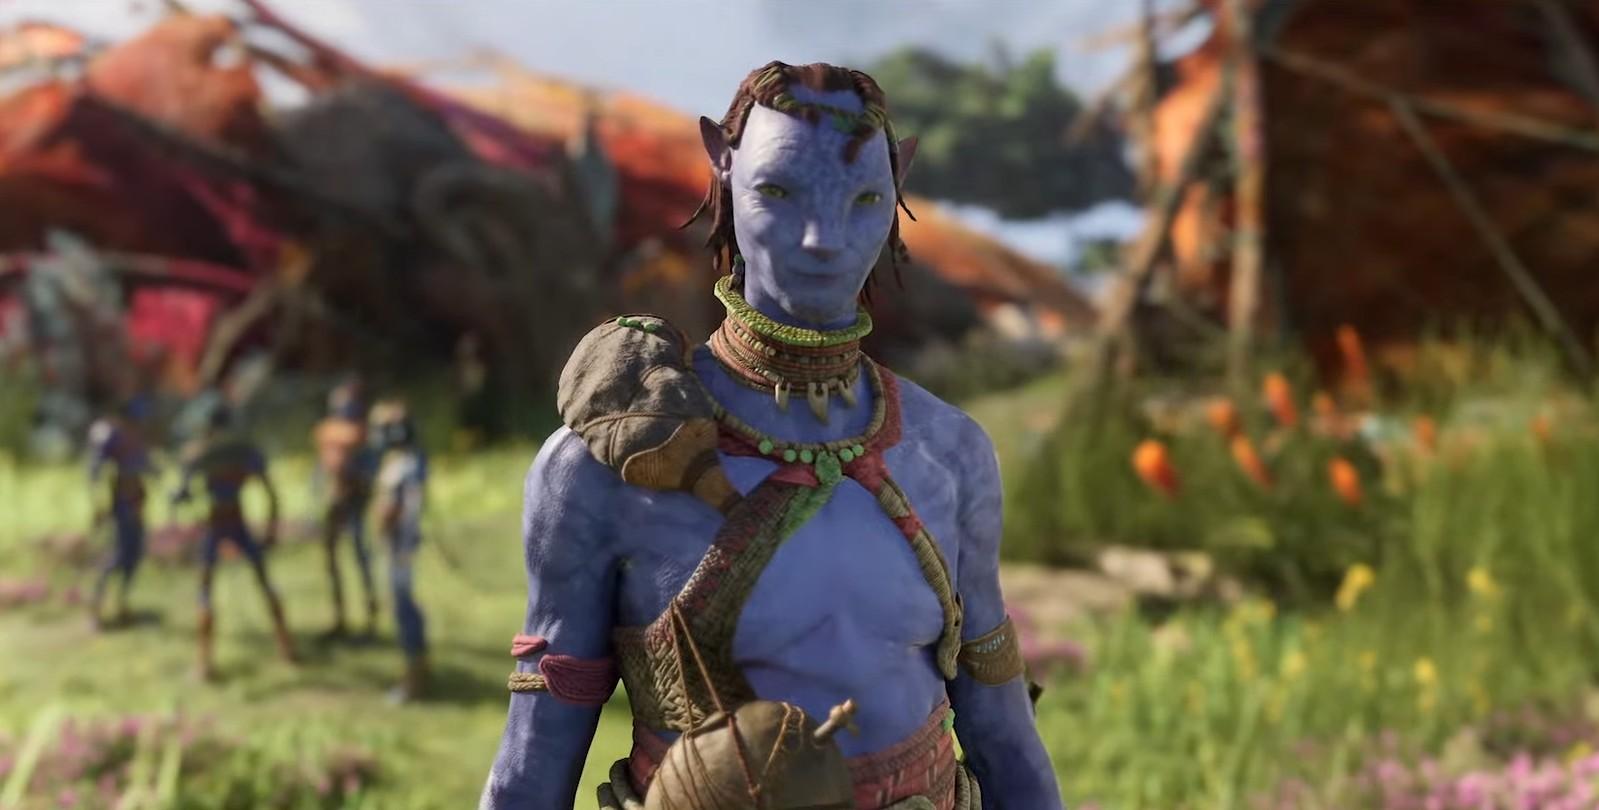 Ubisoft-Forward-avatar-frontiers-of-pandora-reveal-2